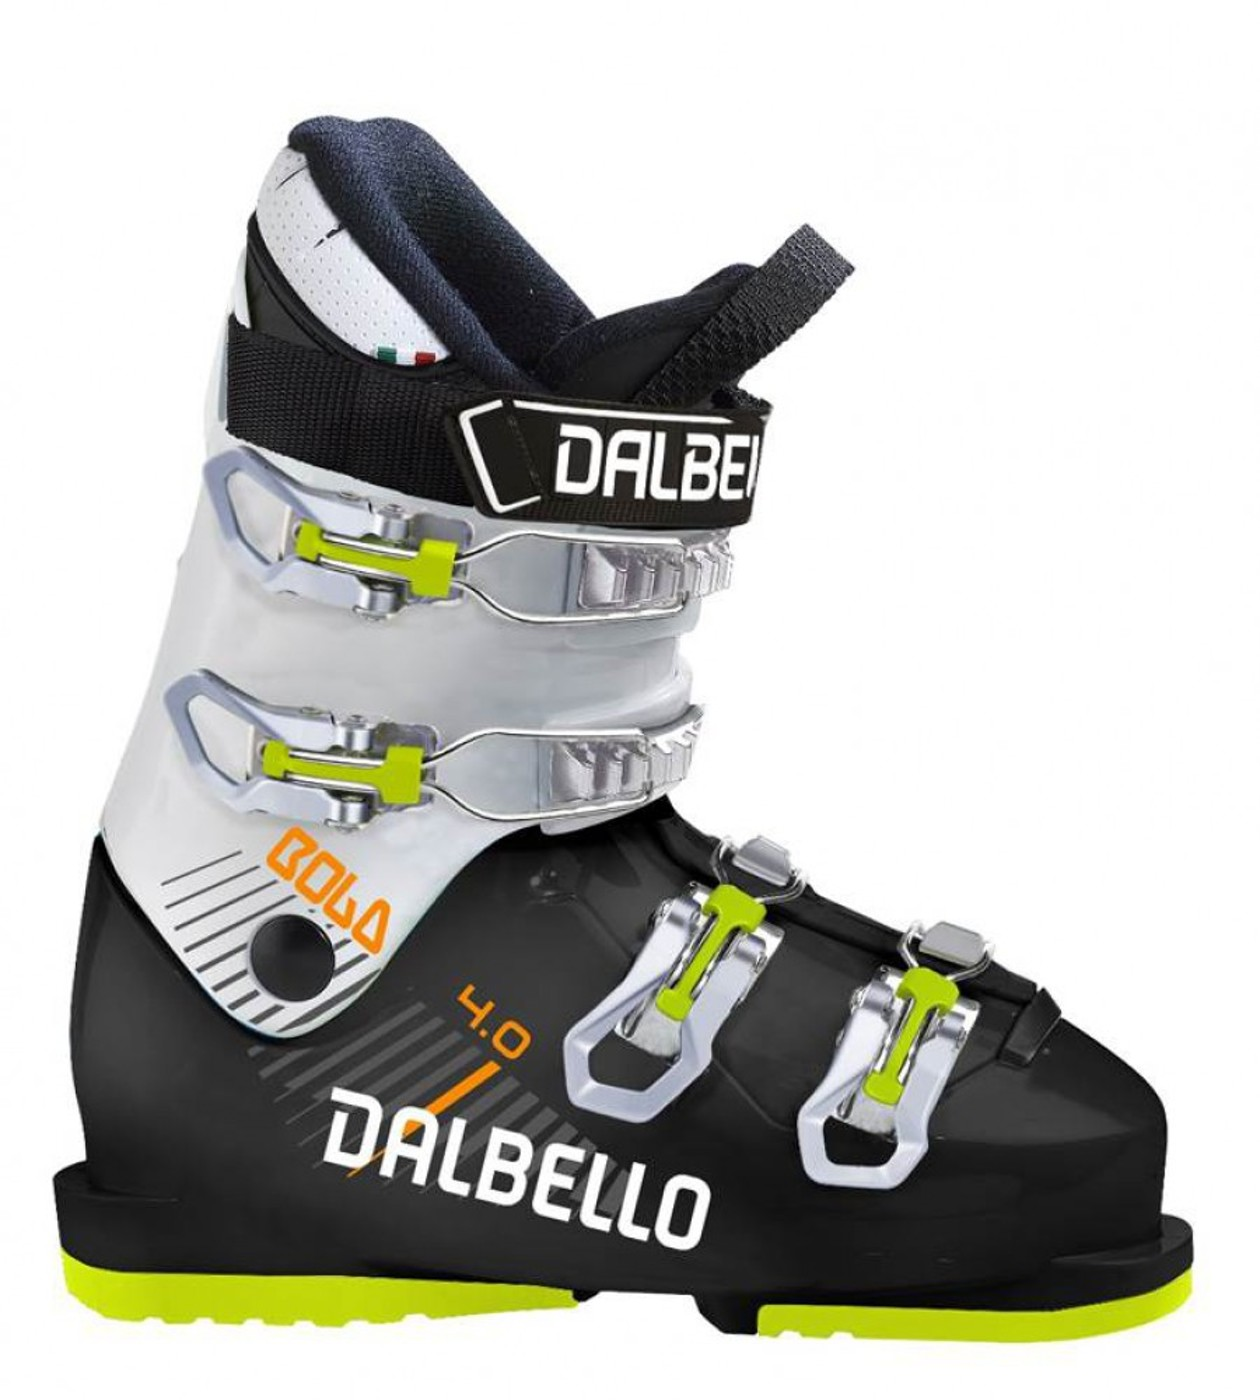 DALBELLO RTL-BOLD 4.0 - Kinder